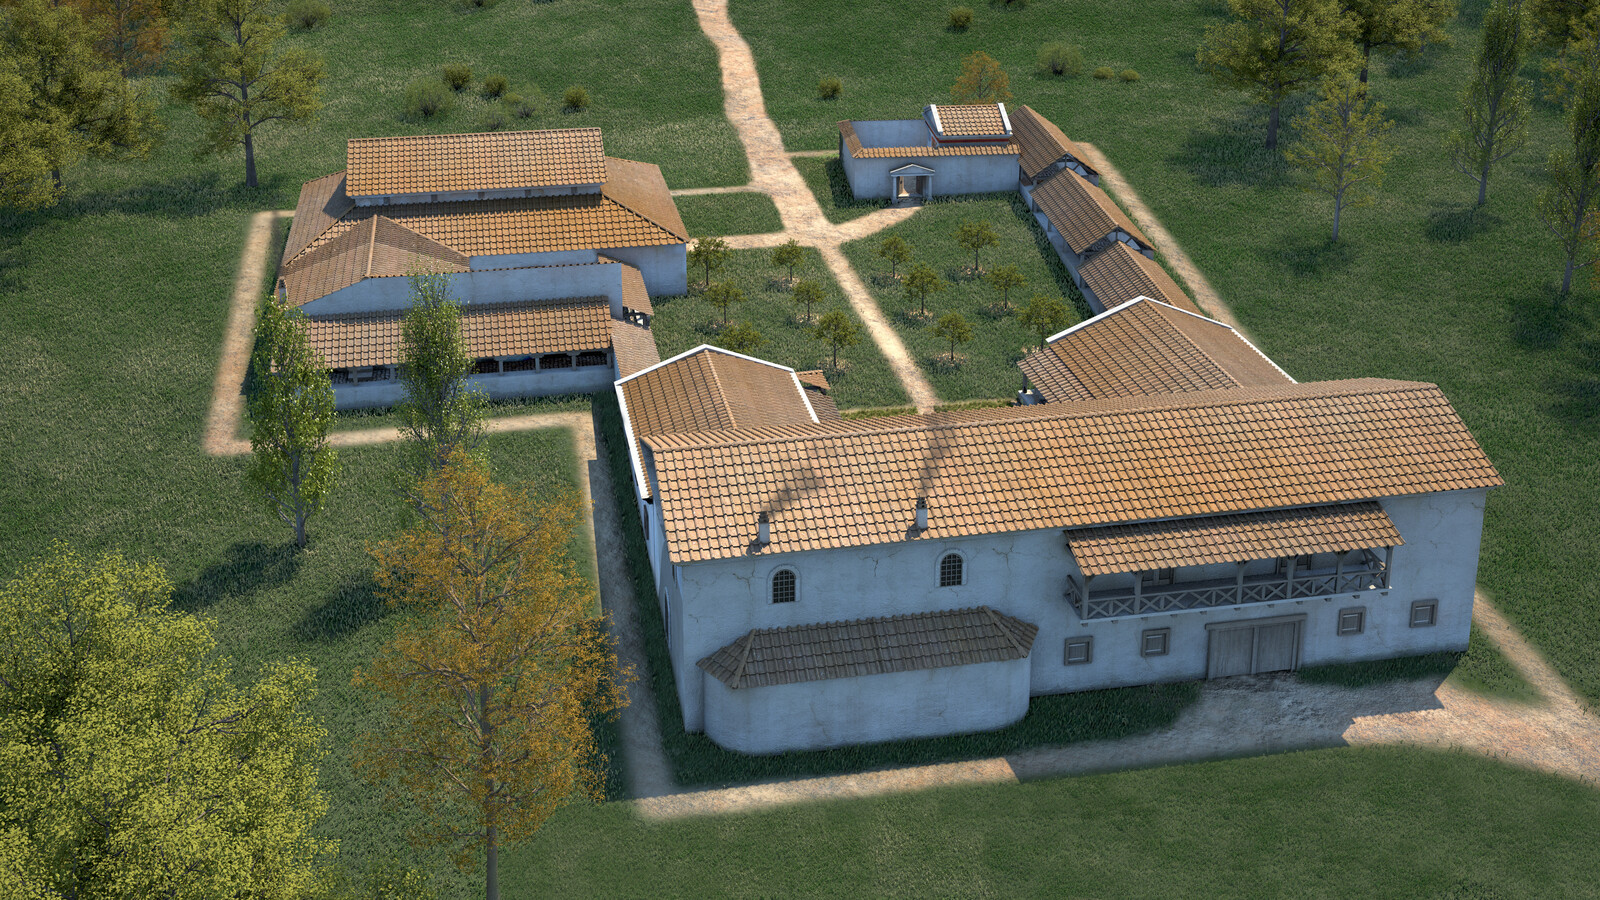 Roman Villa of Weyregg - East view